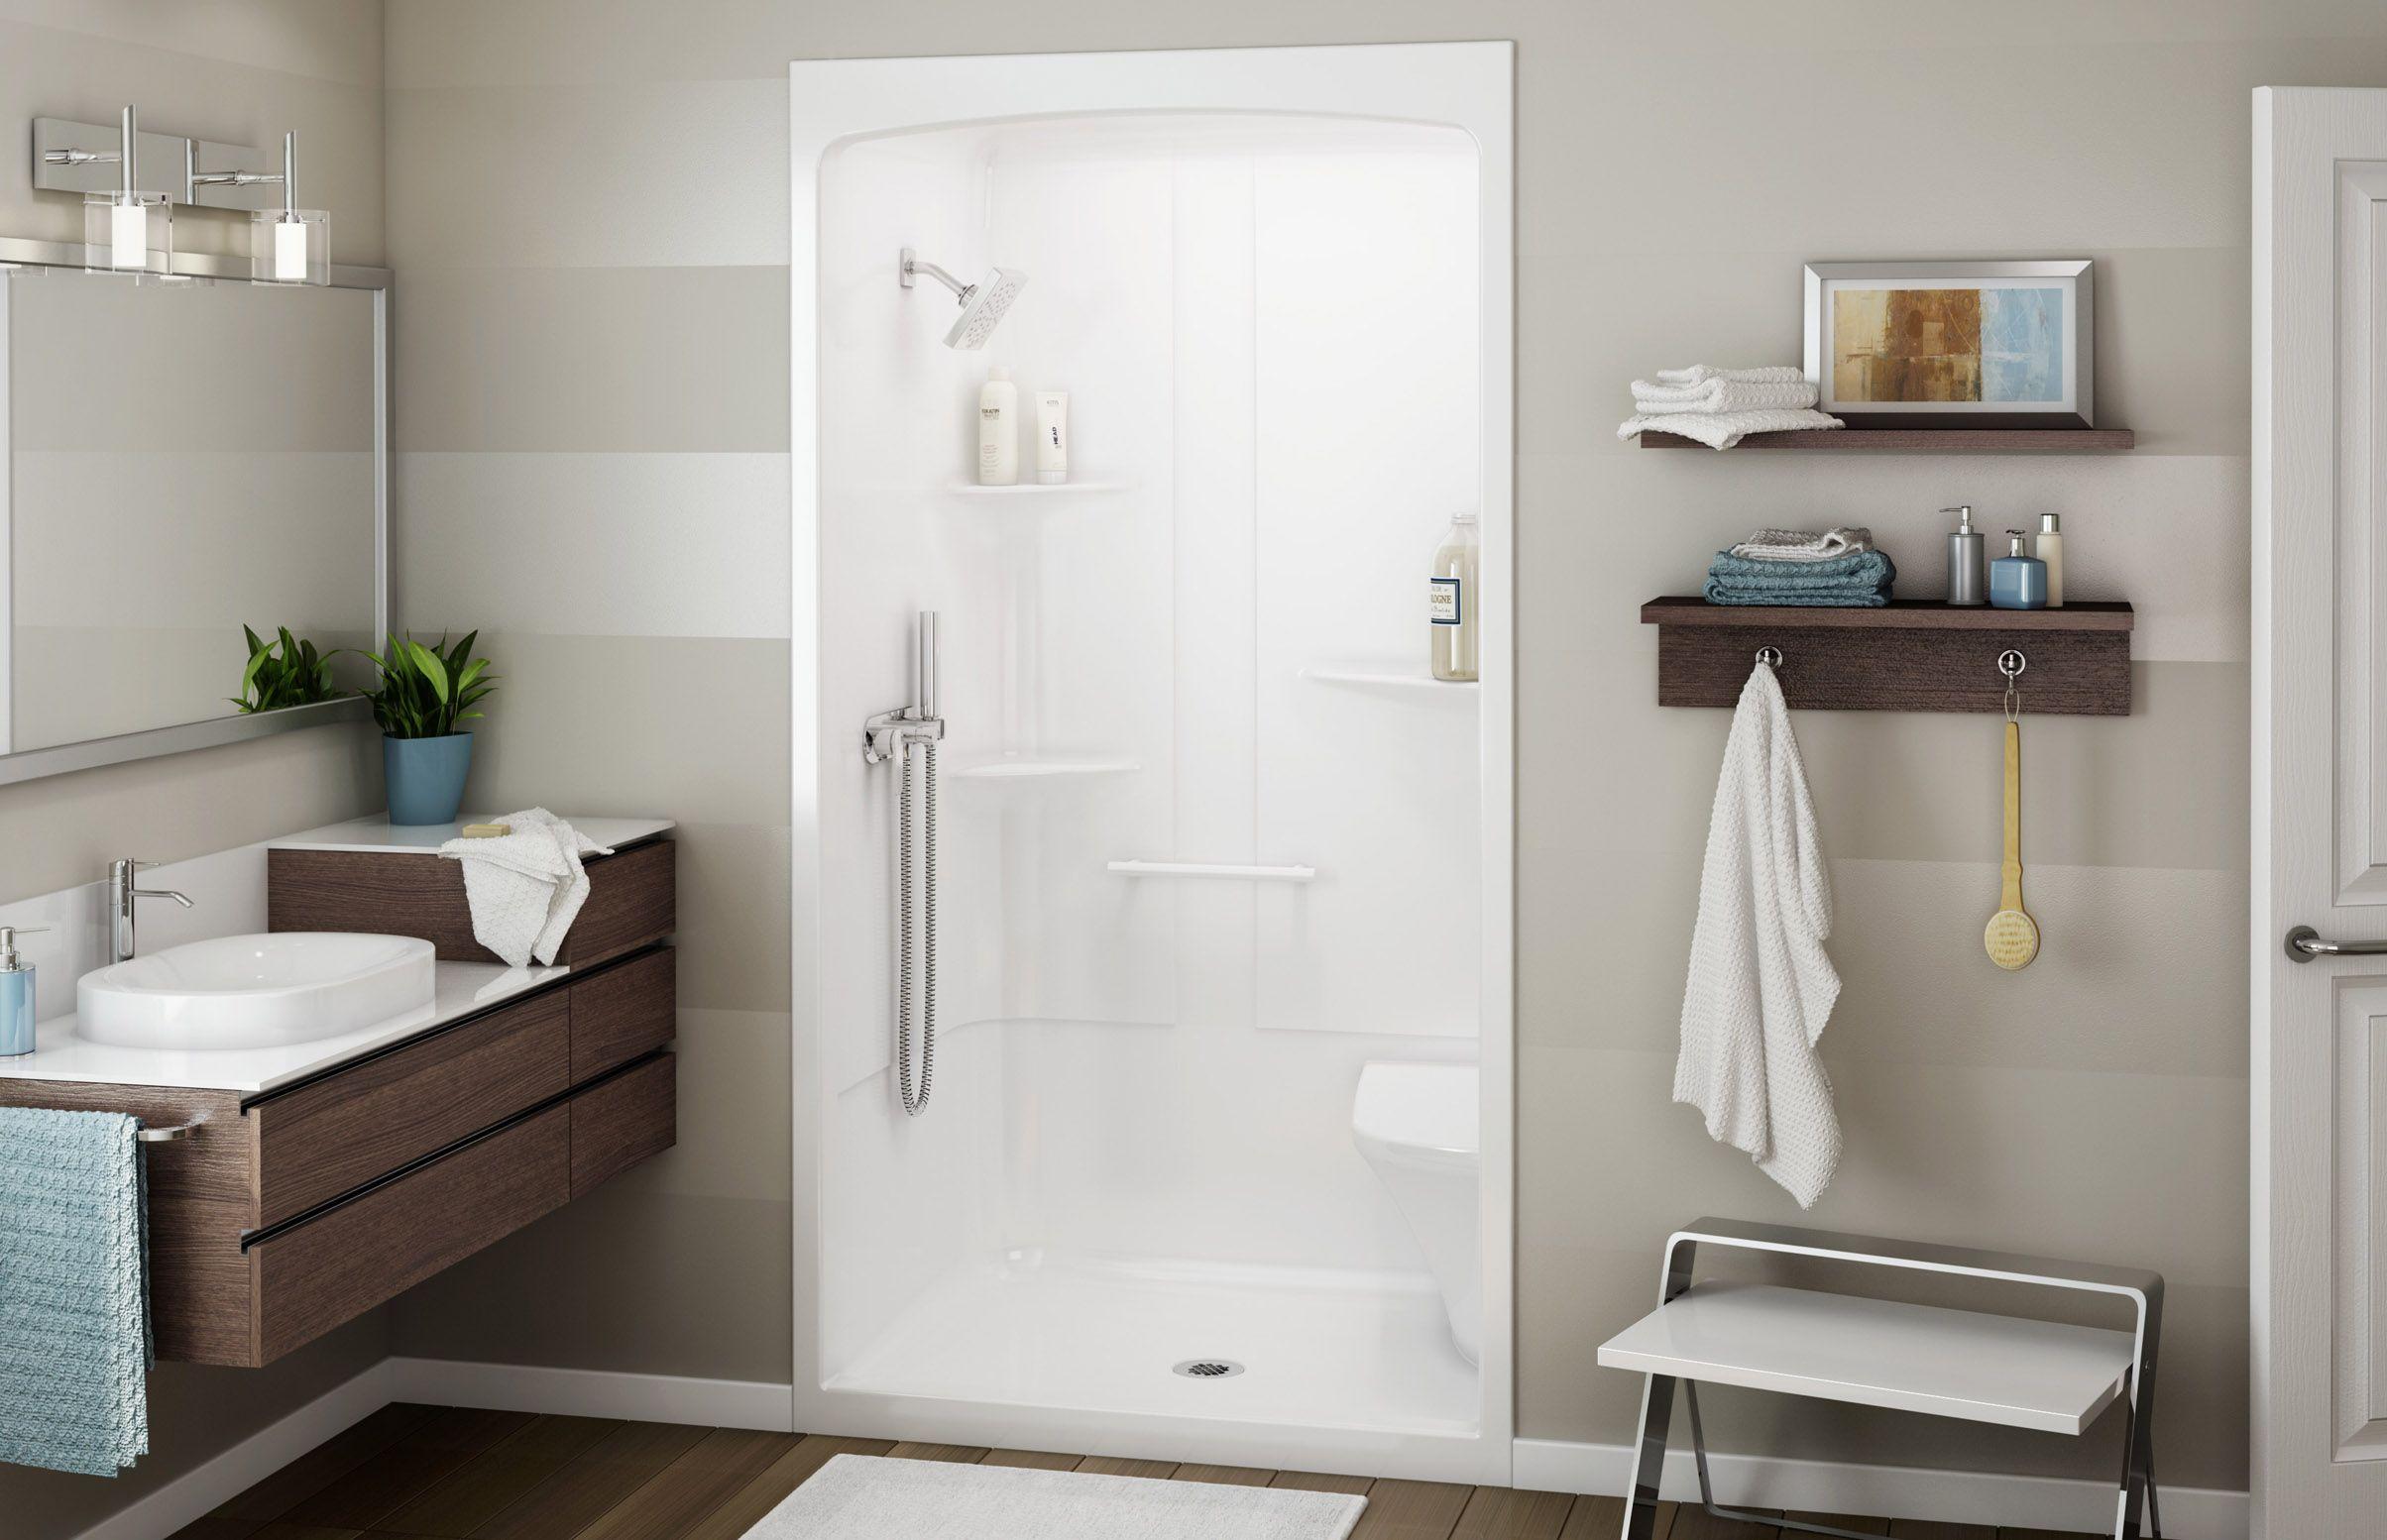 Allia Shr 4834 Alcove Showers Maax Professional One